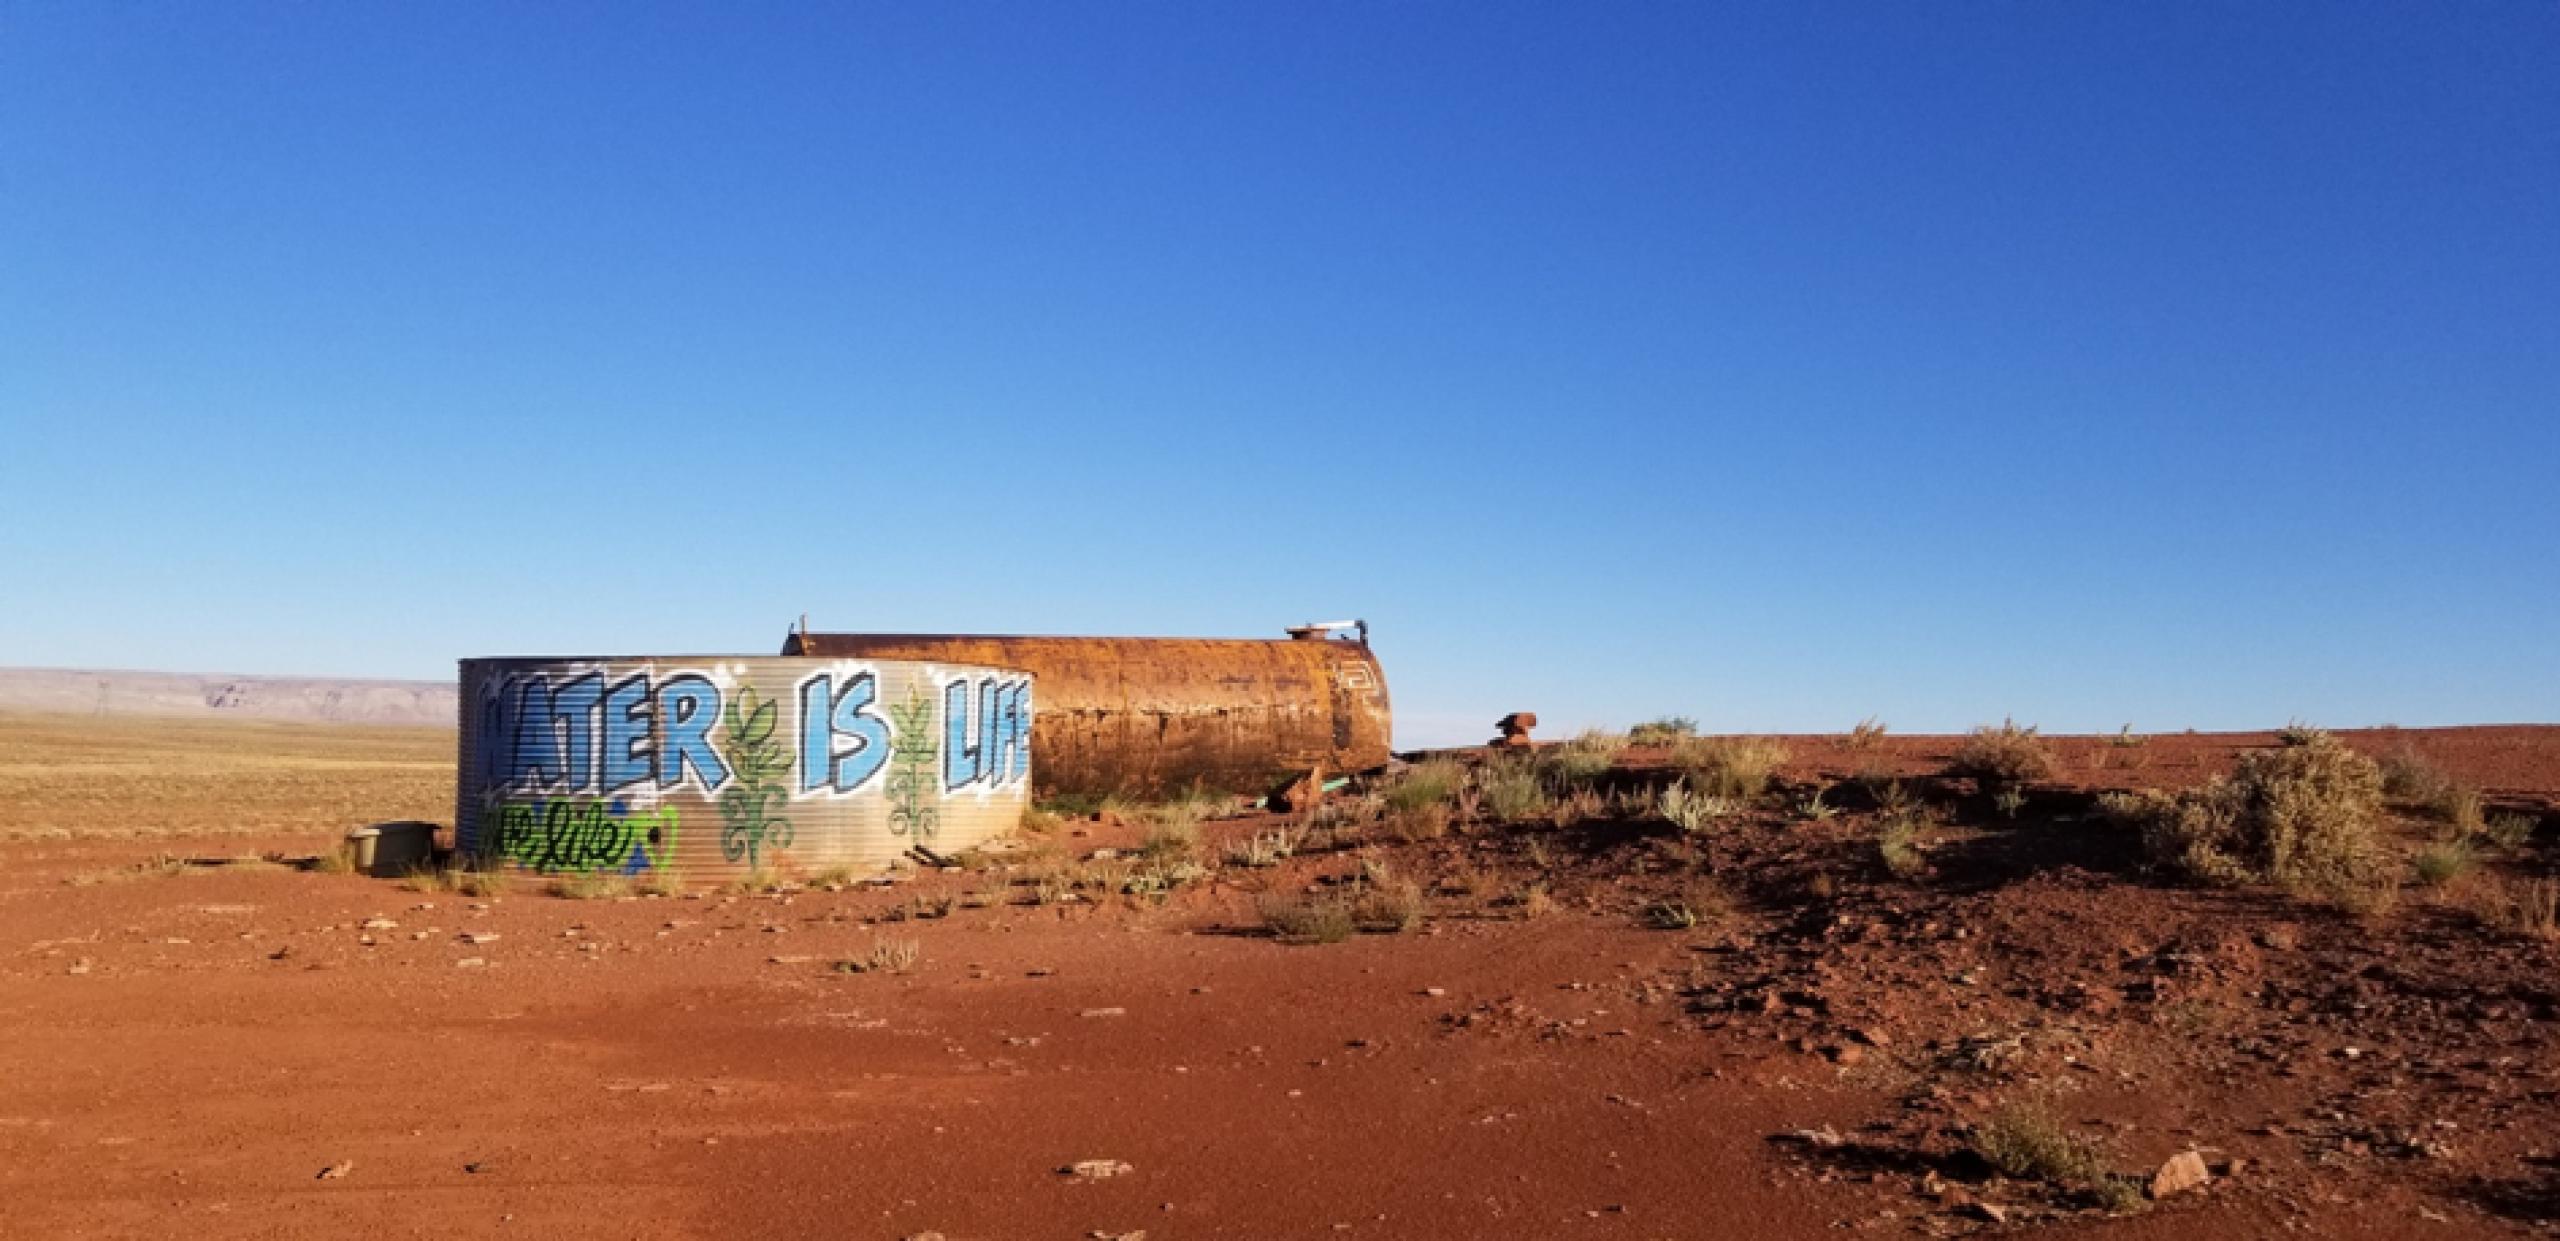 Photo of water tank on Navajo land in Arizona